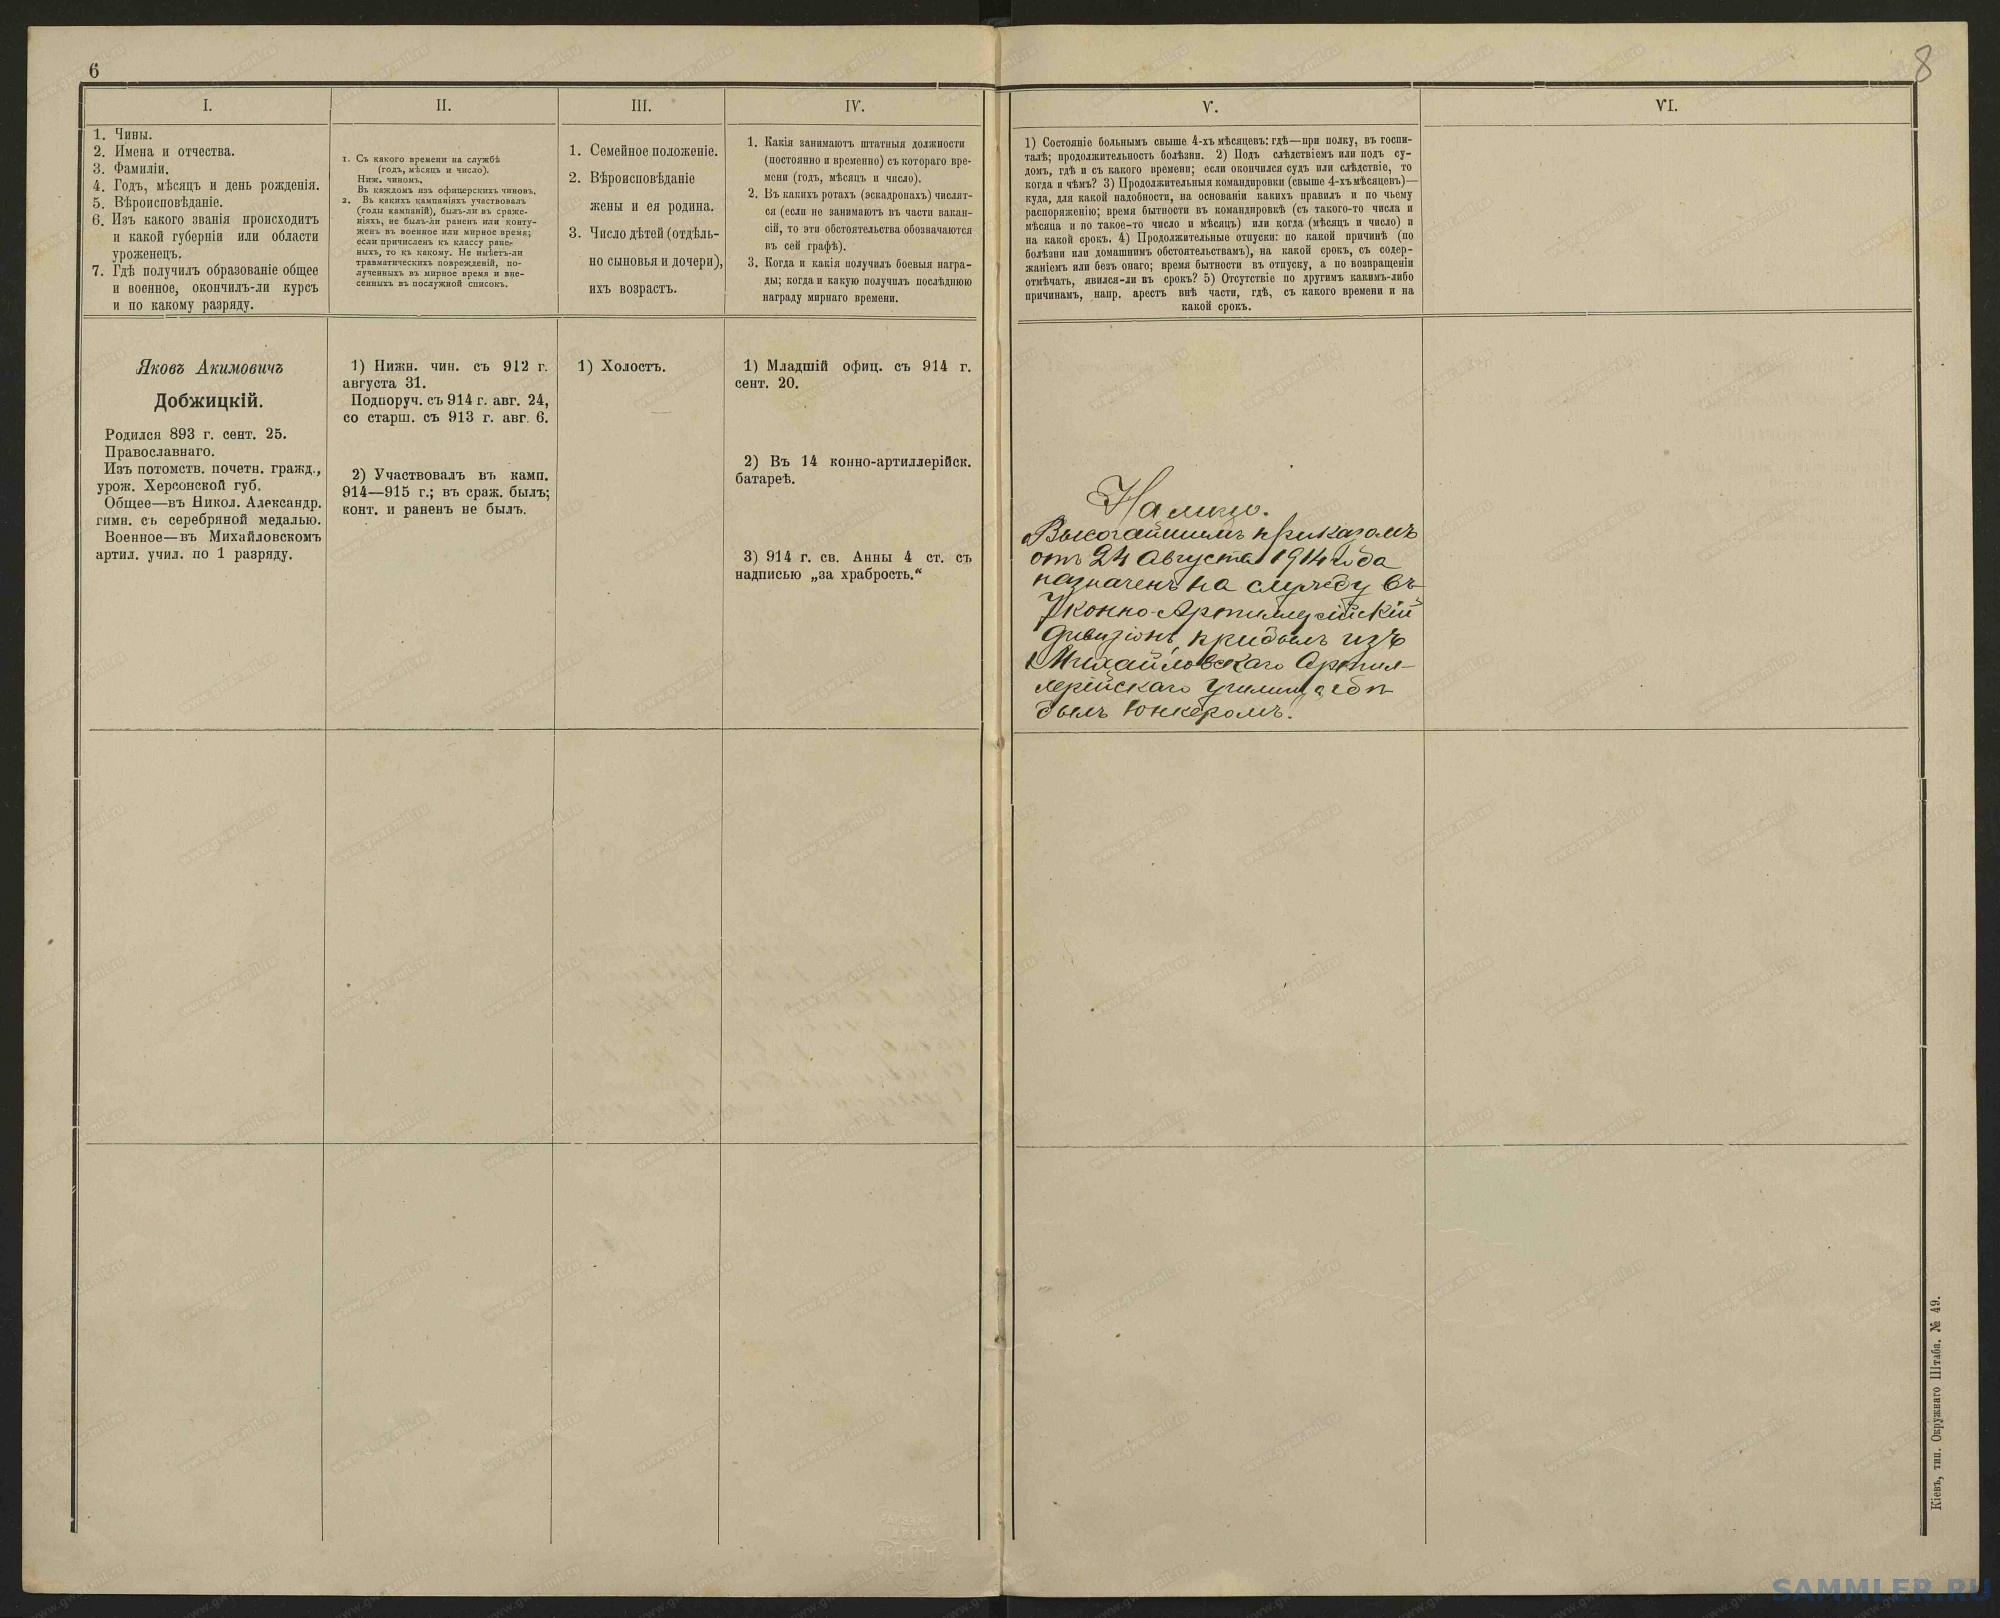 Список офицеров 7-го конно-артиллерийского дивизиона на 01.01.1915__10_.jpg